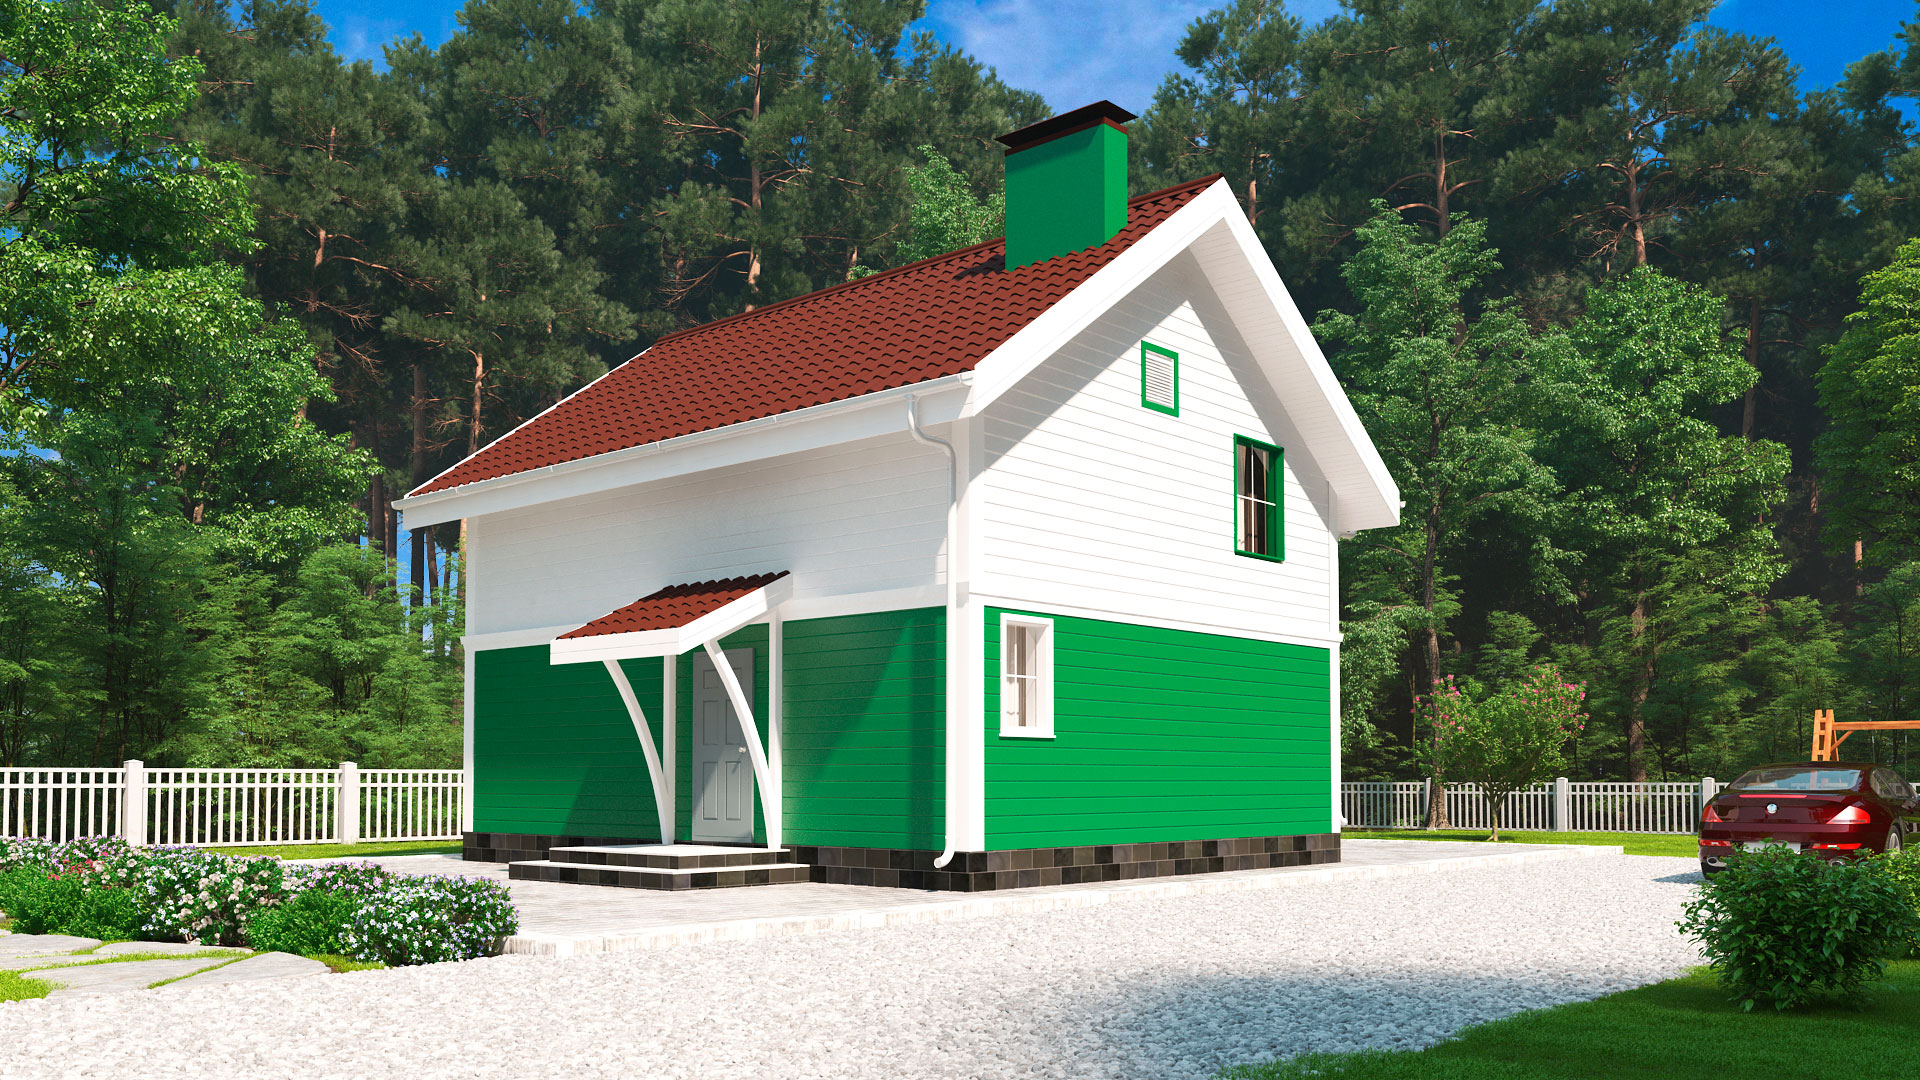 Боковой фасад двухэтажного загородного мансардного дома БЭНПАН, проект МС-117.